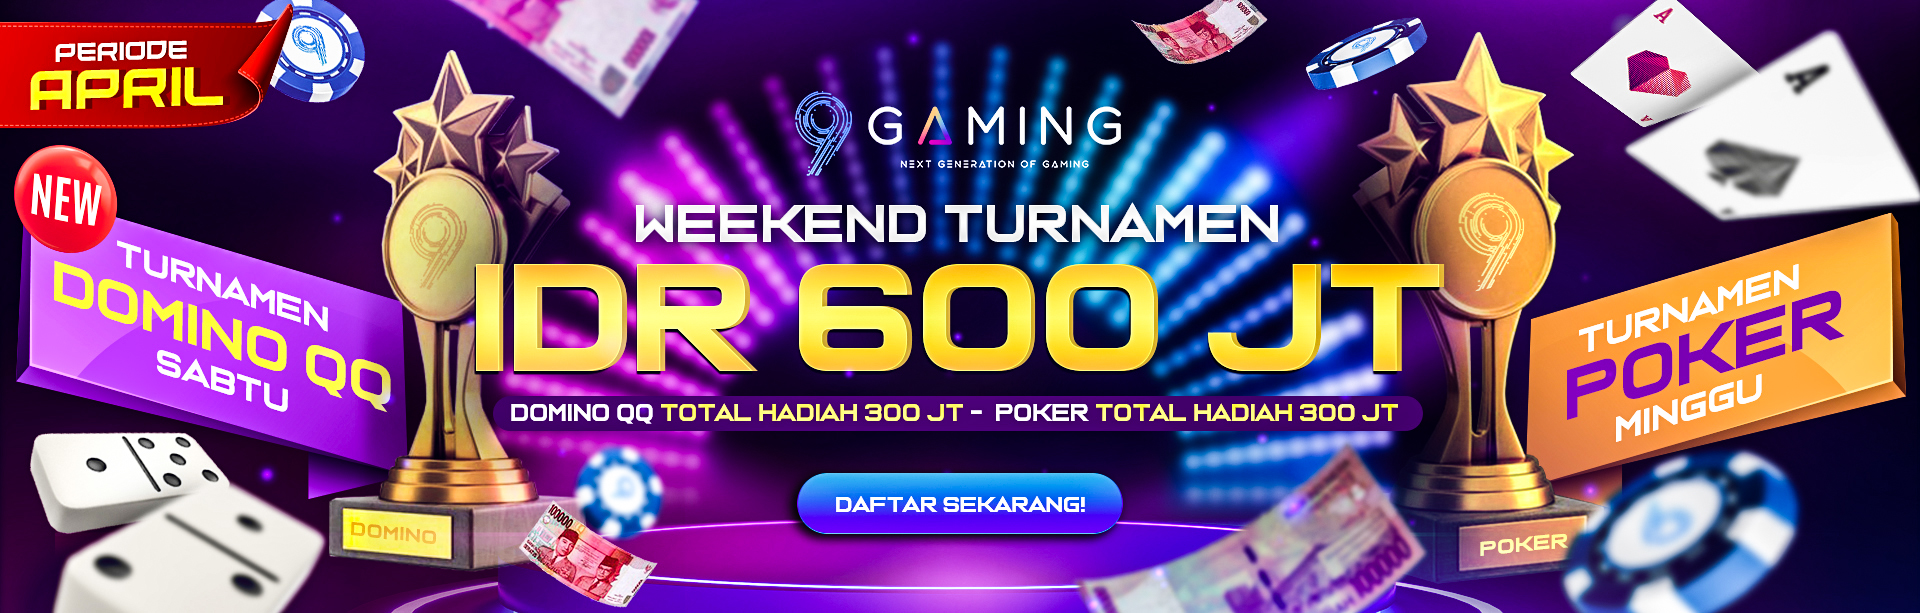 Tournament 9GAMING